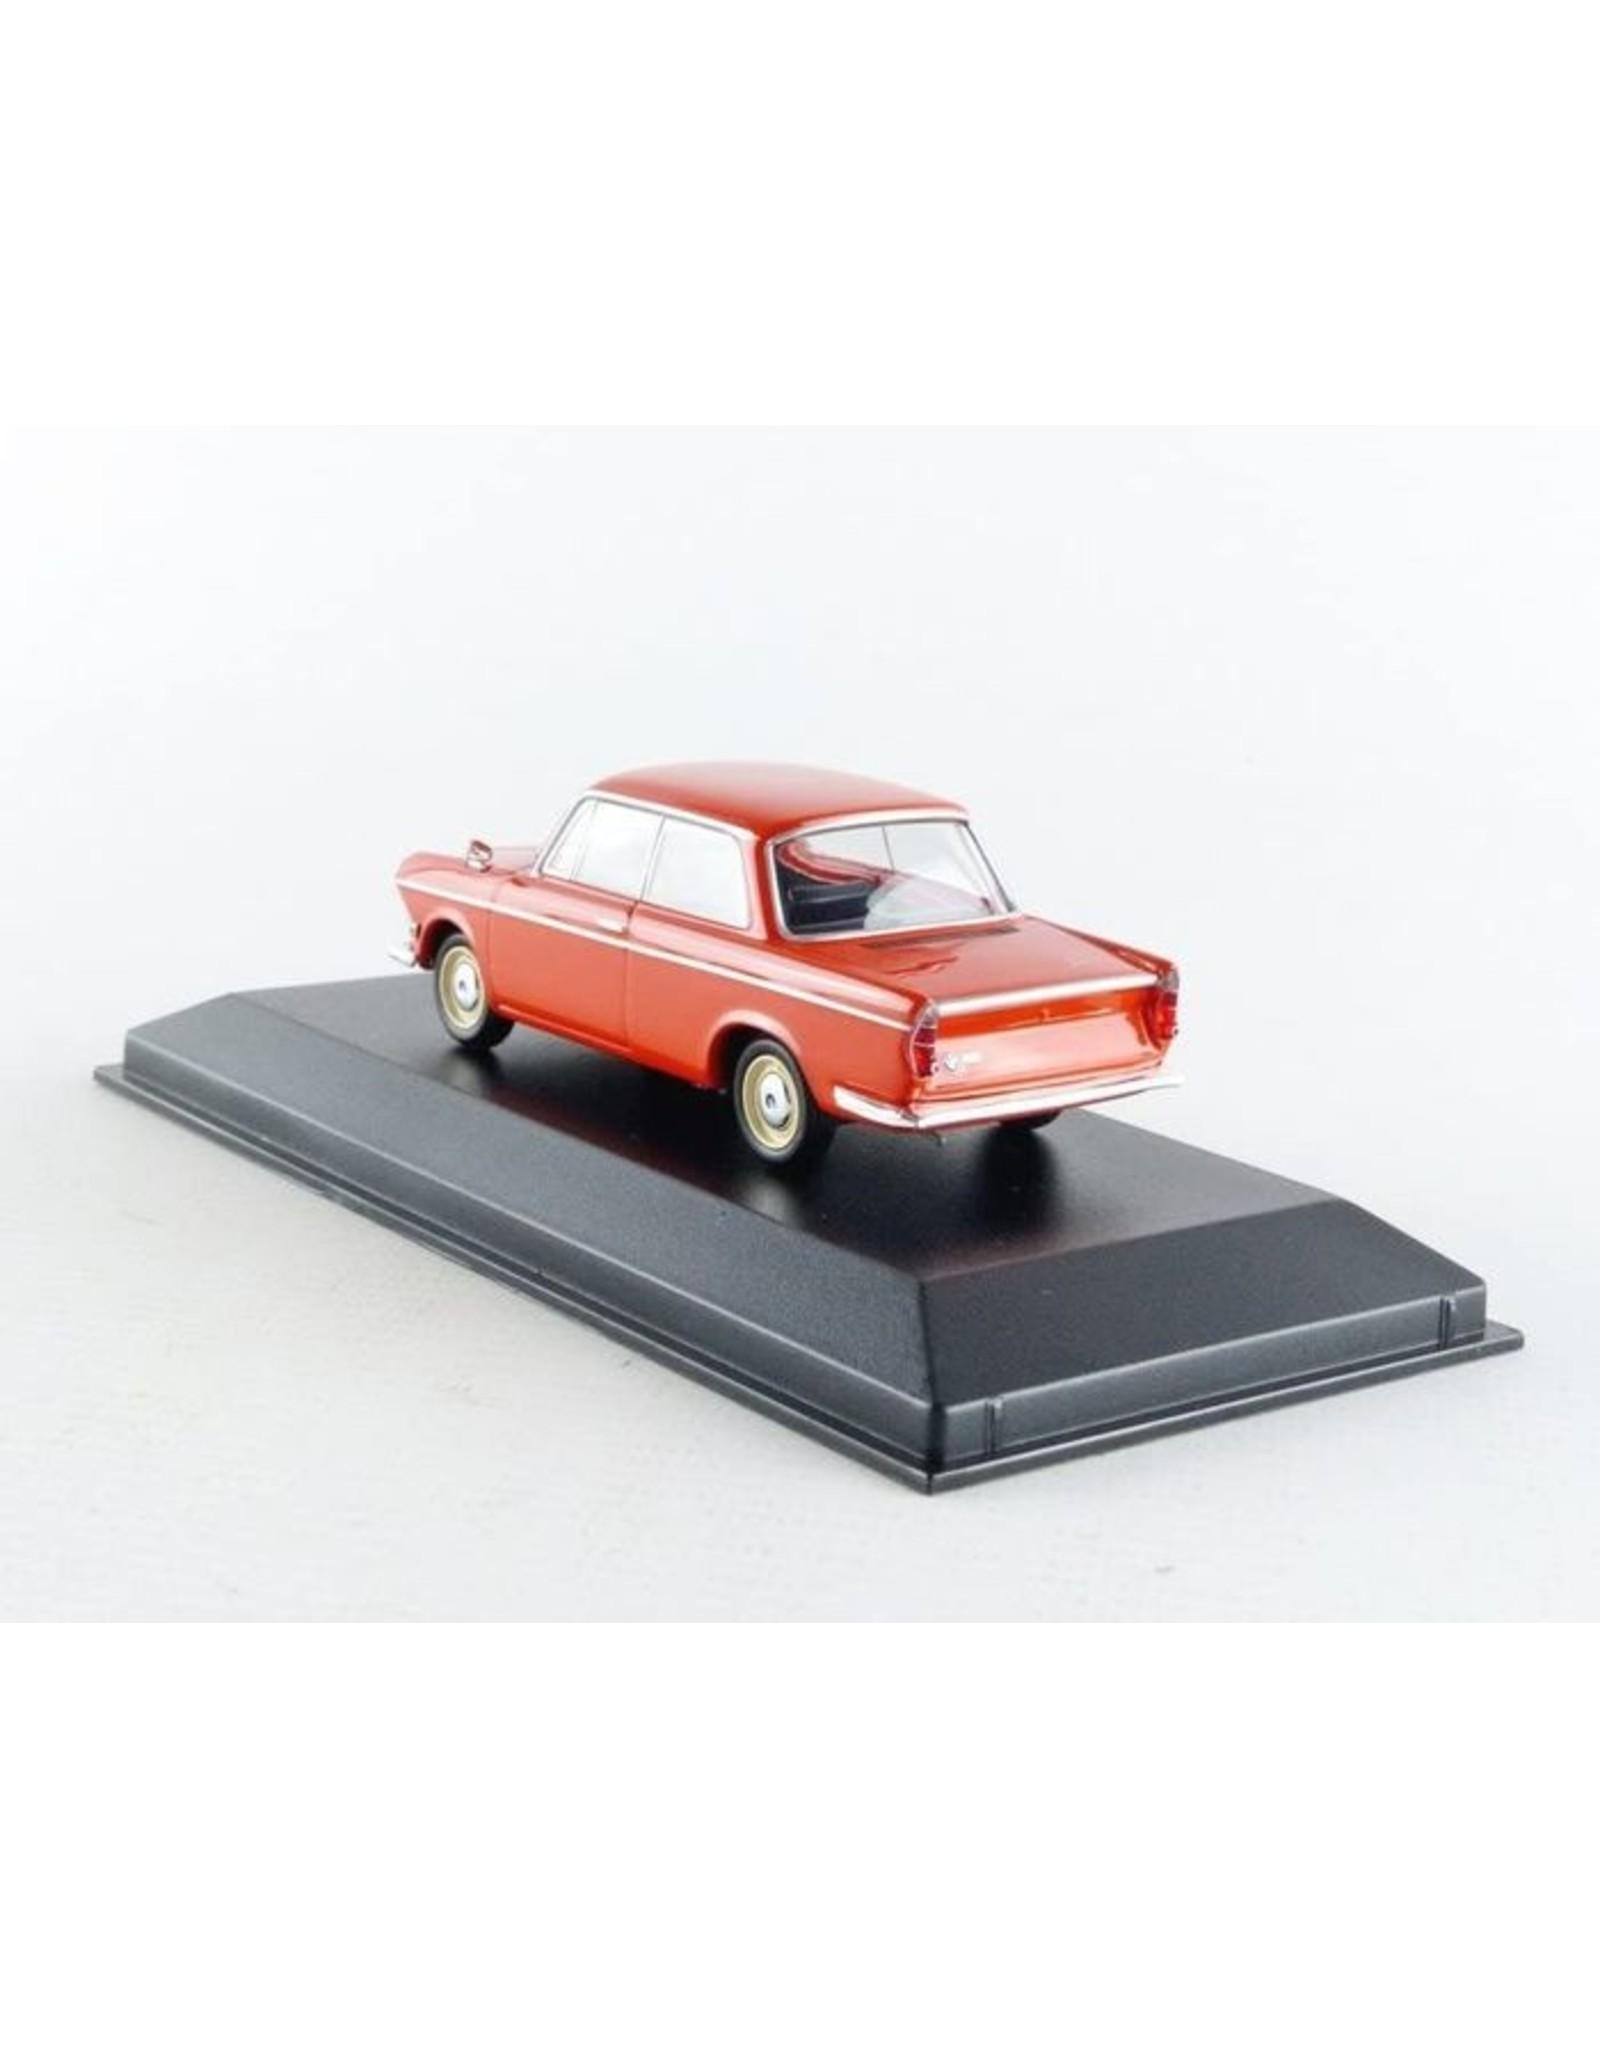 BMW BMW 700 LS 1960 - 1:43 - MaXichamps